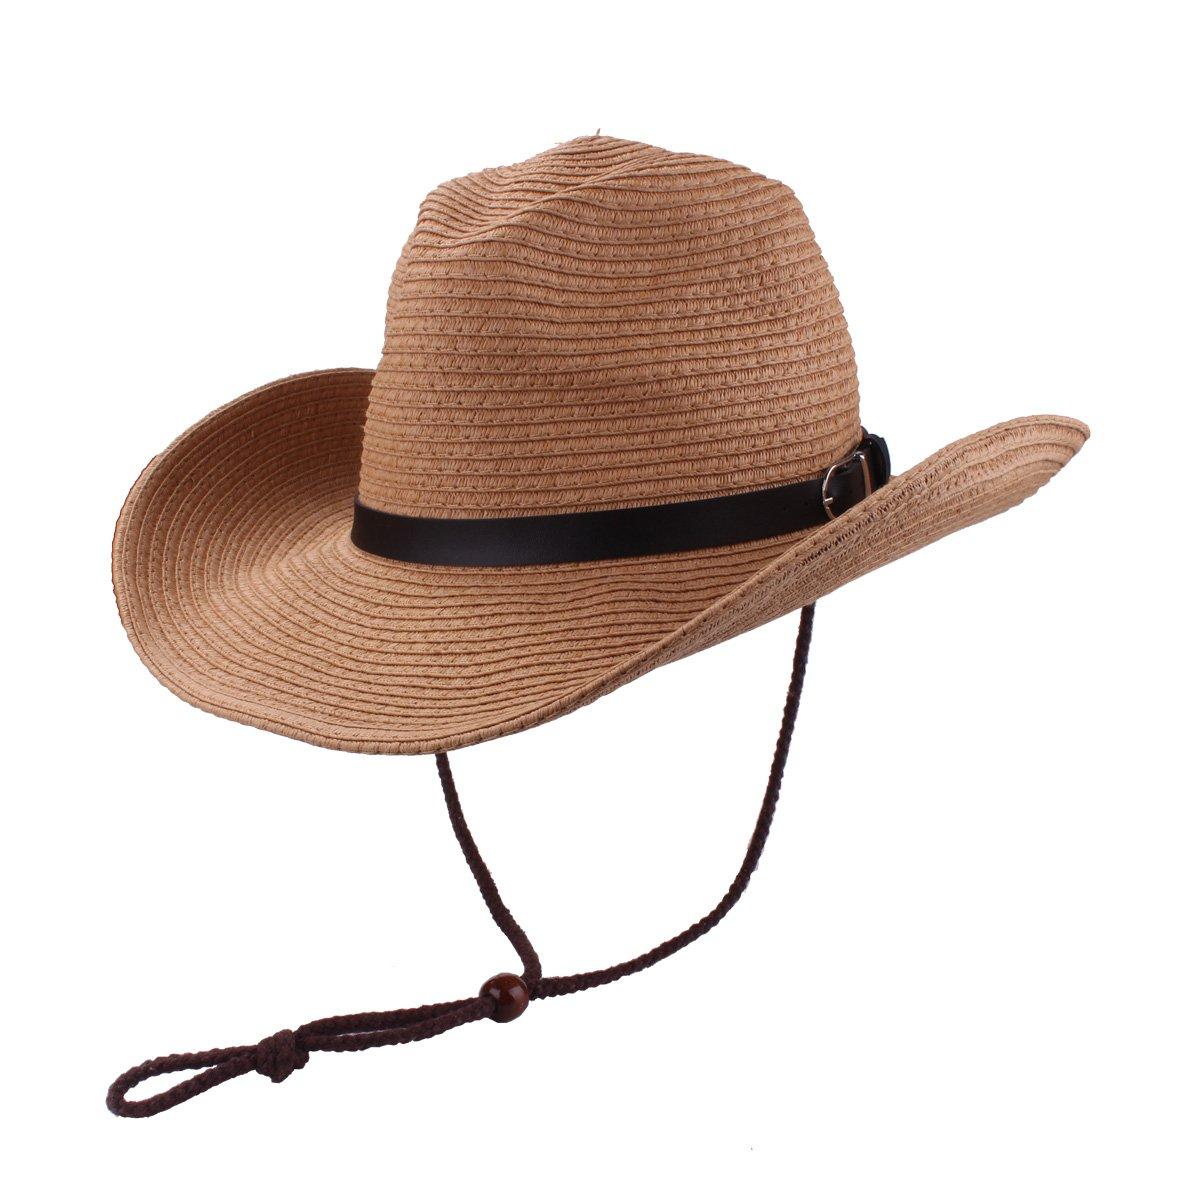 Men's Cowboy Hat Straw Sunhat Wide Brim Western Cowgirl Beach Sun Caps